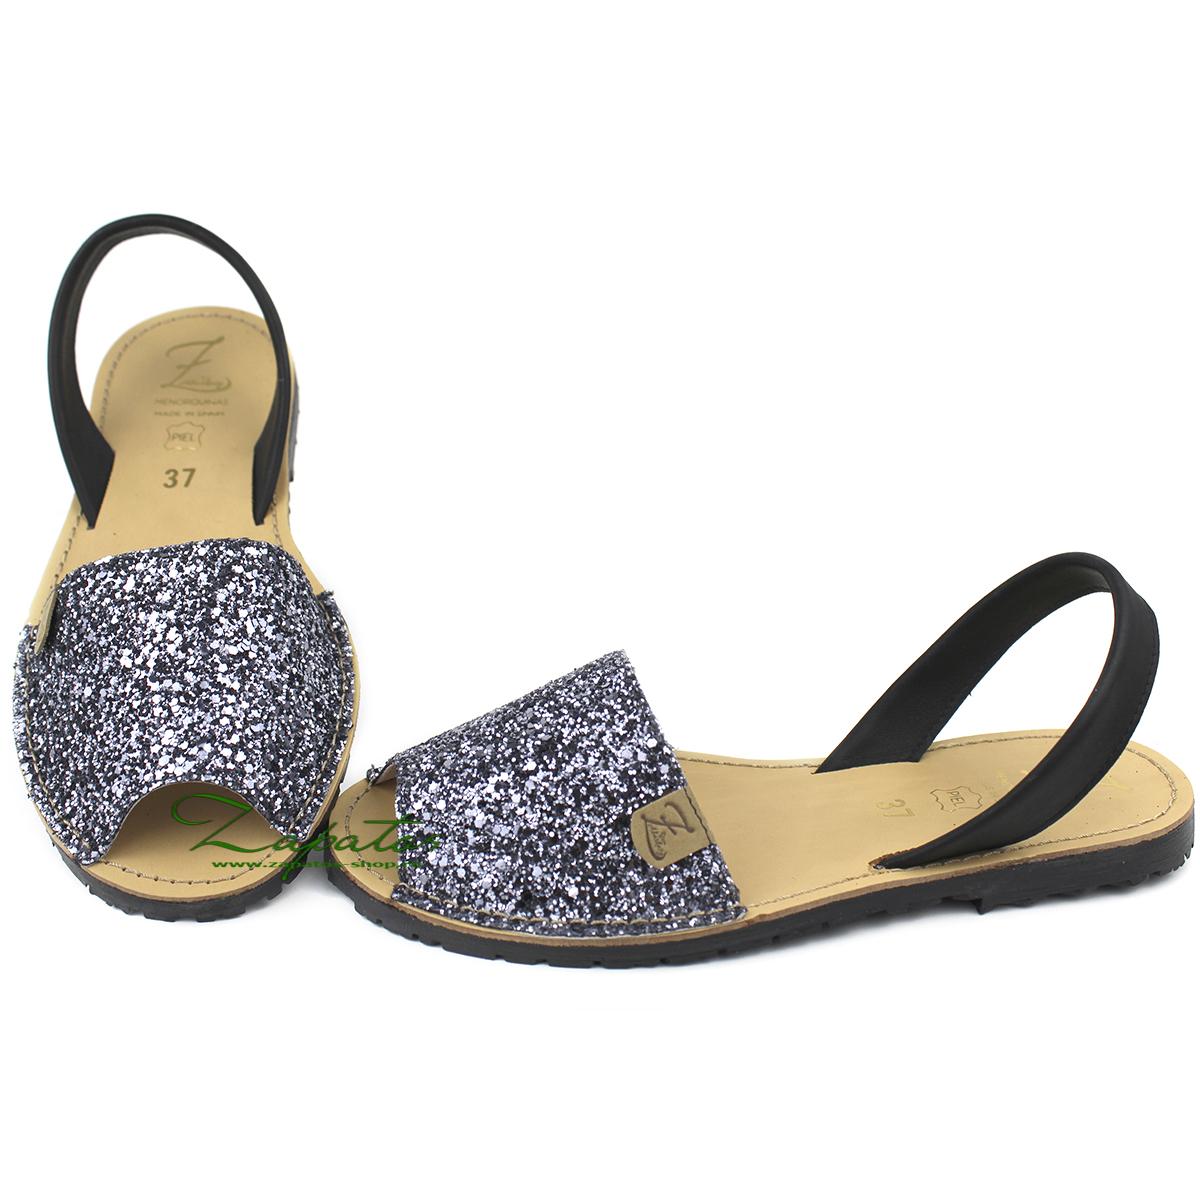 AB. Zapatos 320-5 ANTRACITA — АКЦИЯ